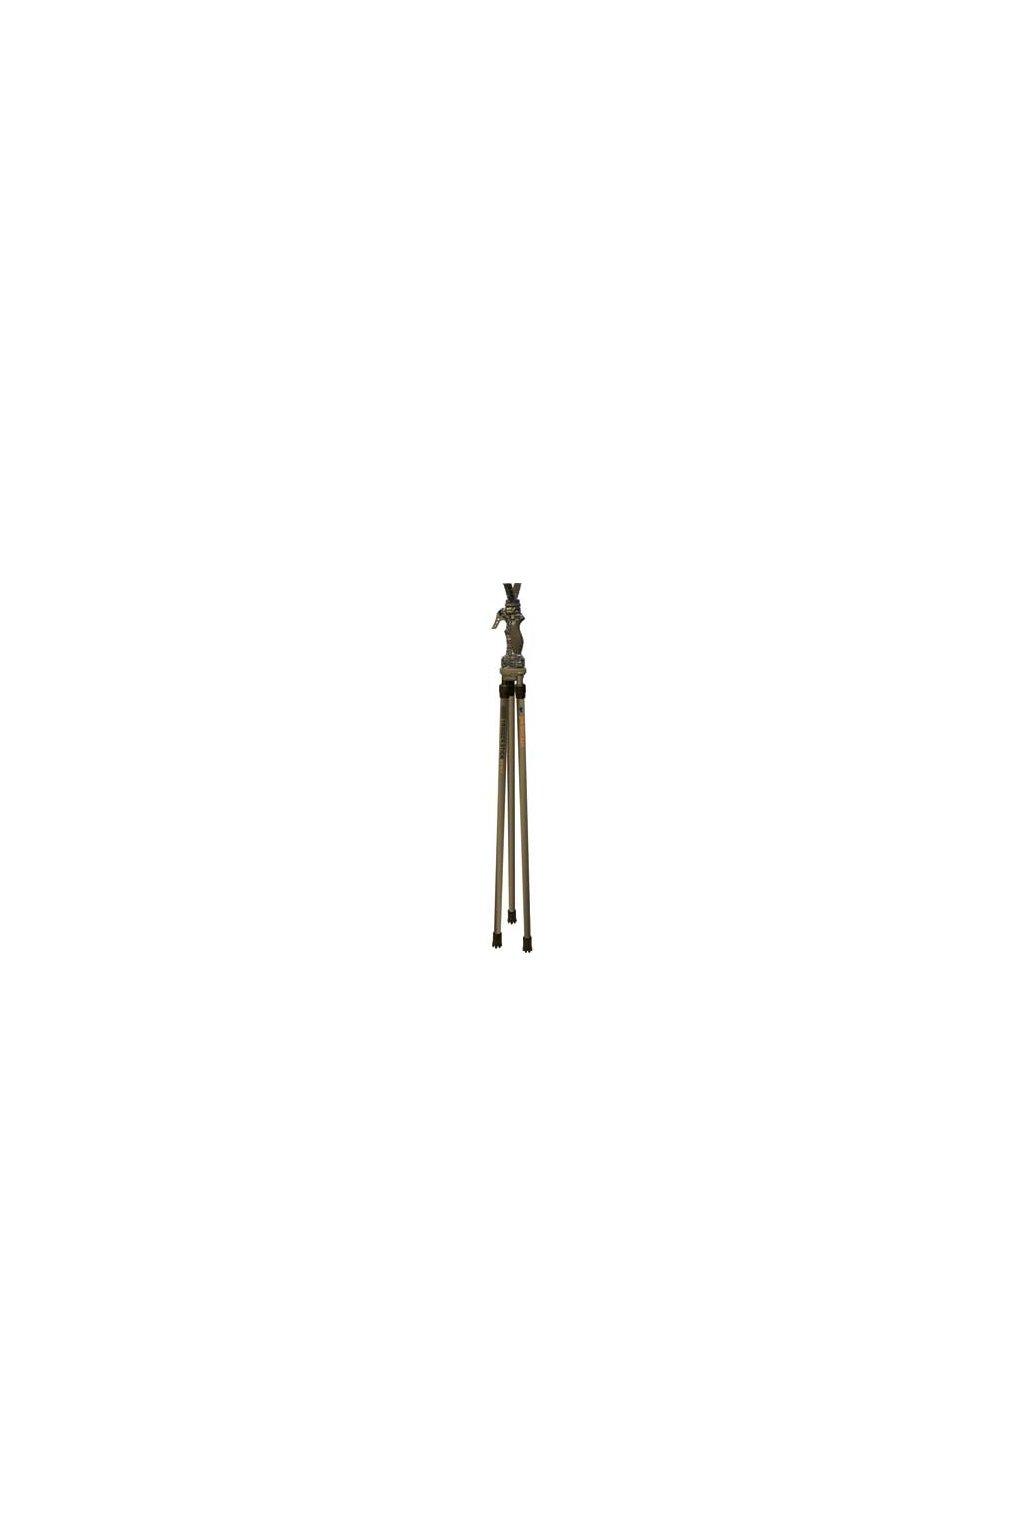 PRIMOS -  Trigger Stick® GEN 3 TALL